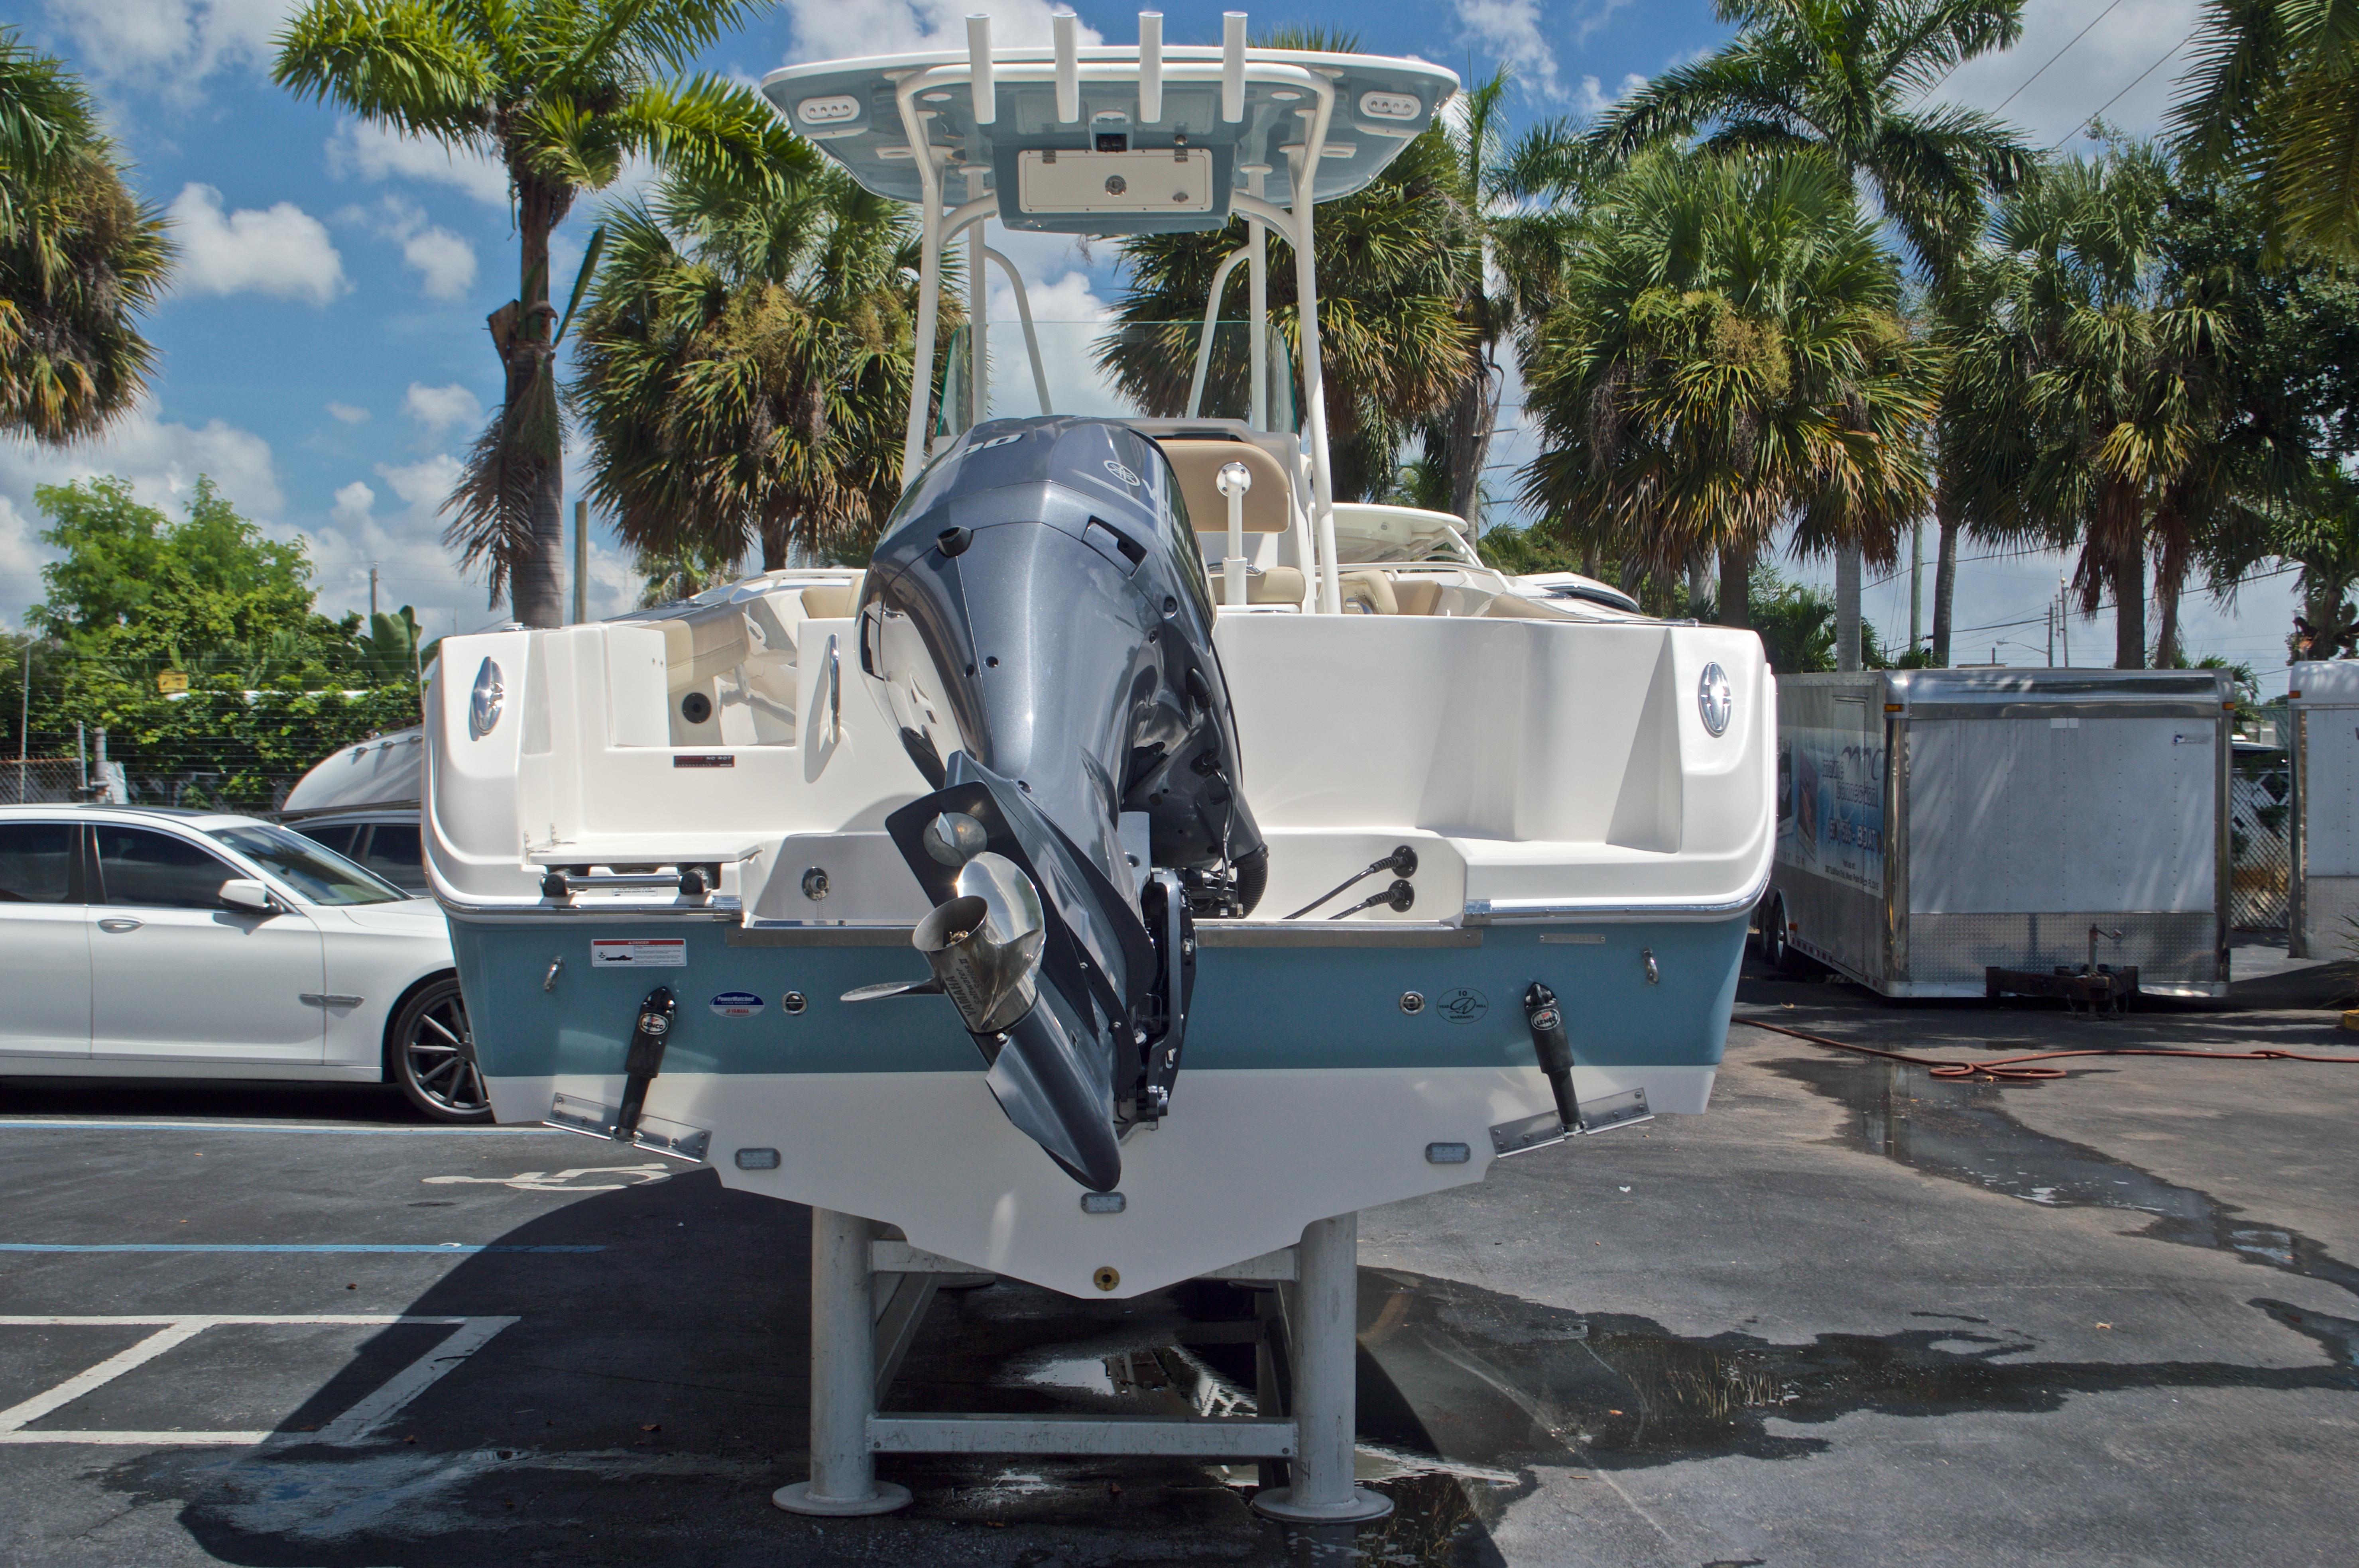 Thumbnail 6 for New 2017 Sailfish 240 CC Center Console boat for sale in Miami, FL